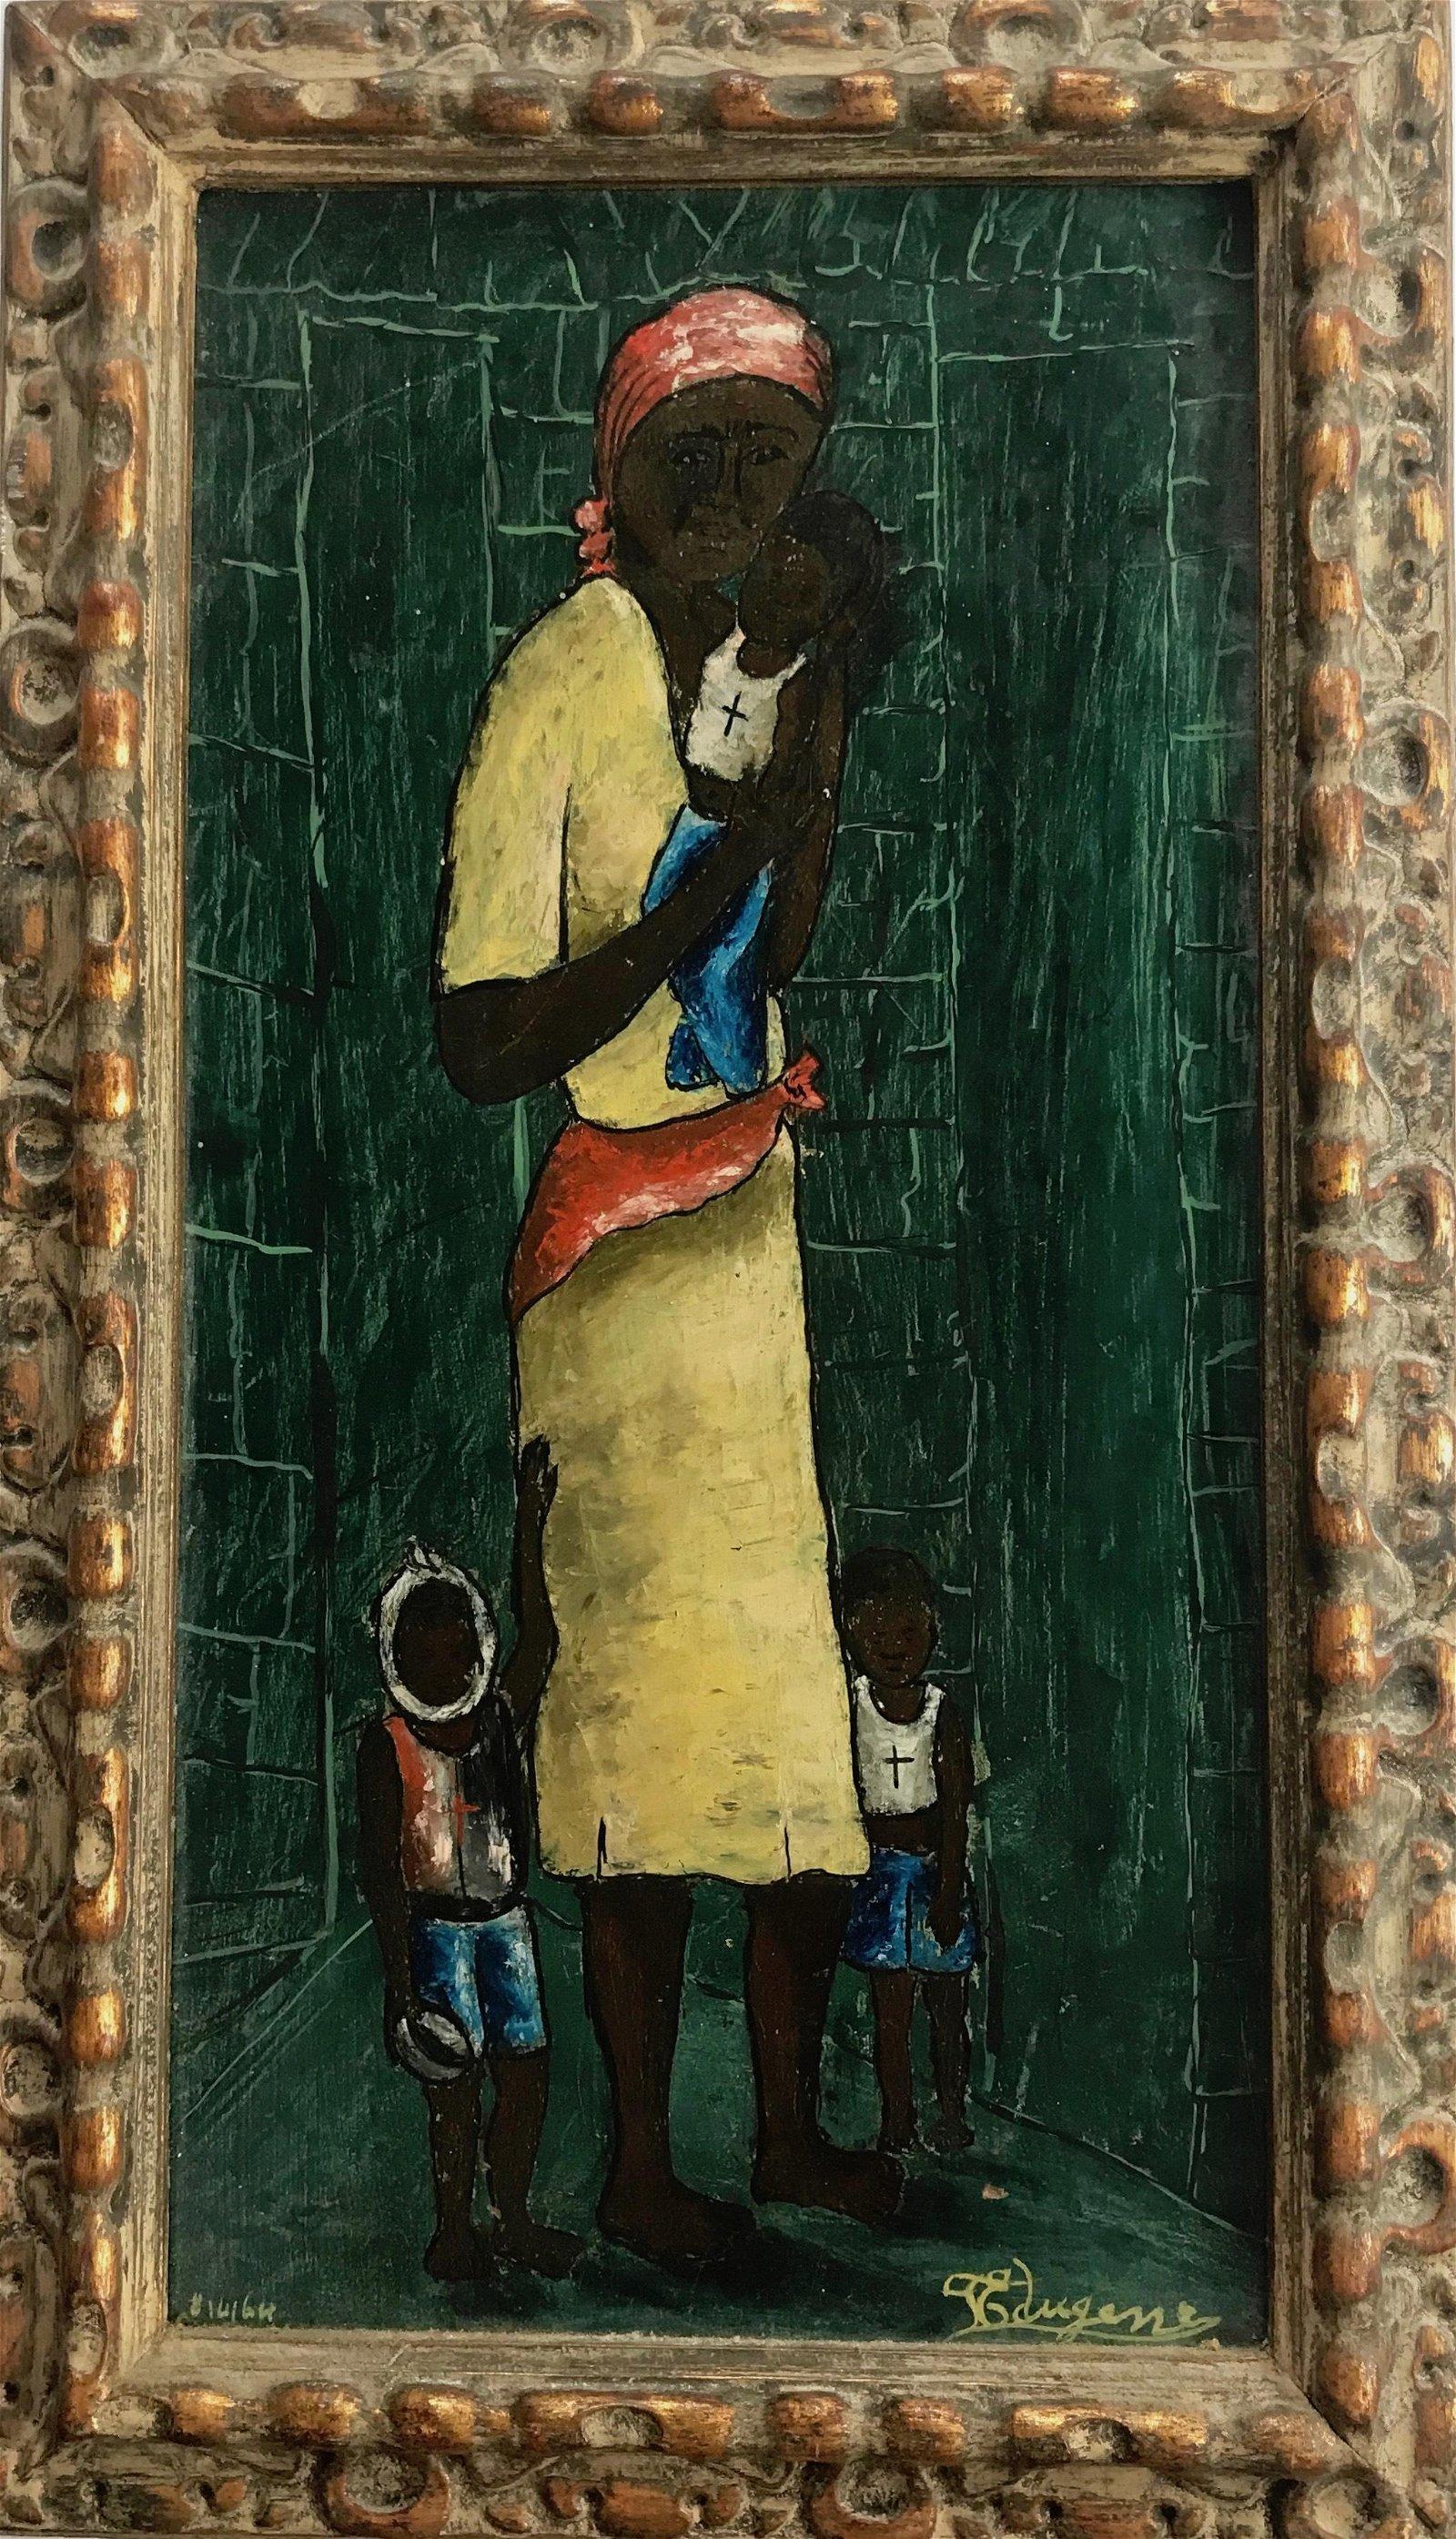 Pierre Edugene Haitian Folk Art Painting 1960s